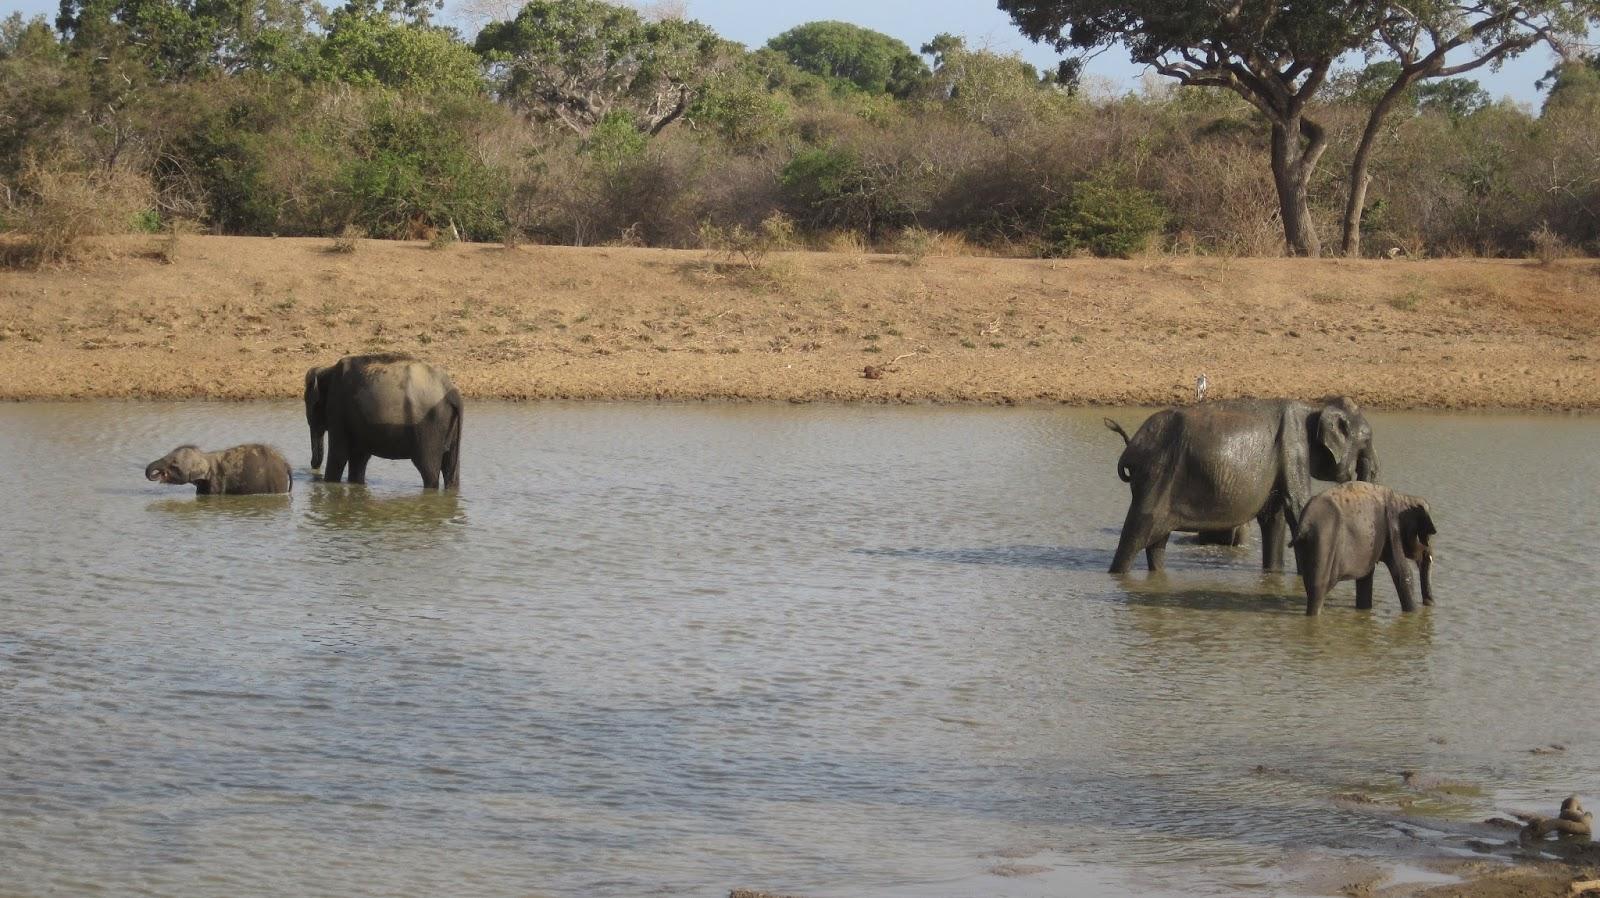 Elefantes en el Parque Nacional de Yala (Sri Lanka)